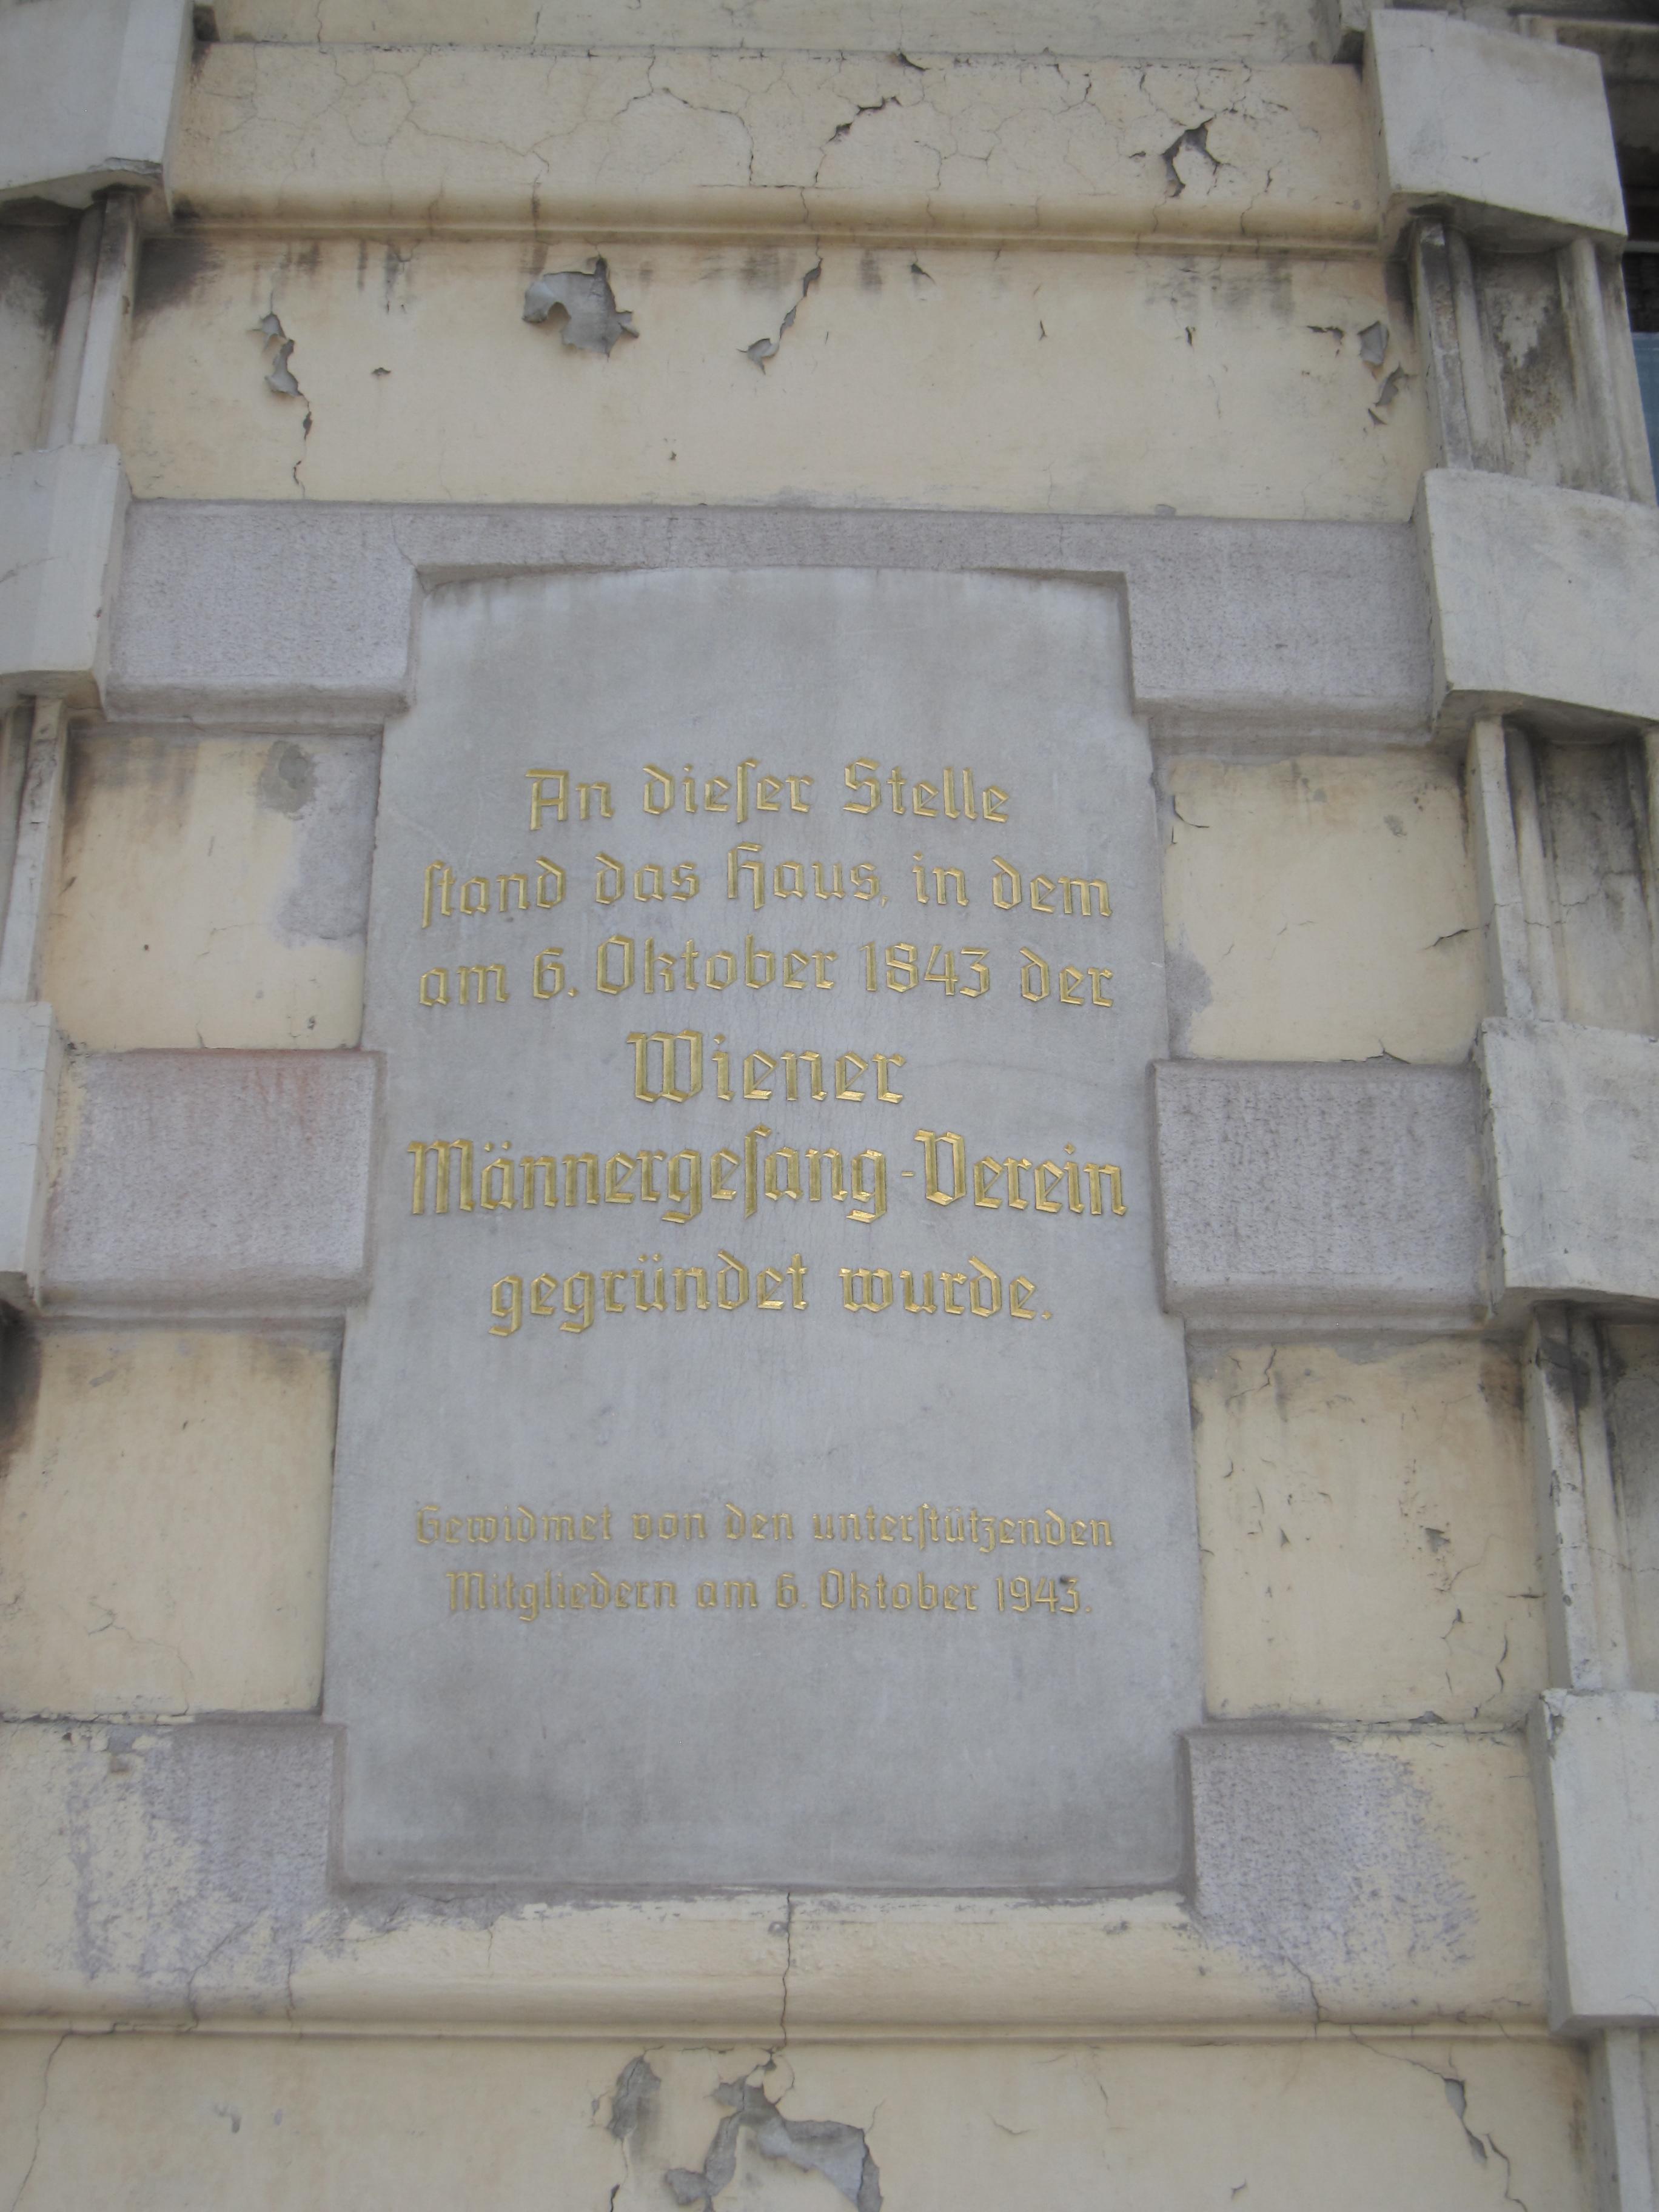 Memorial plaque Wiener Maennergesangs-Verein.jpg